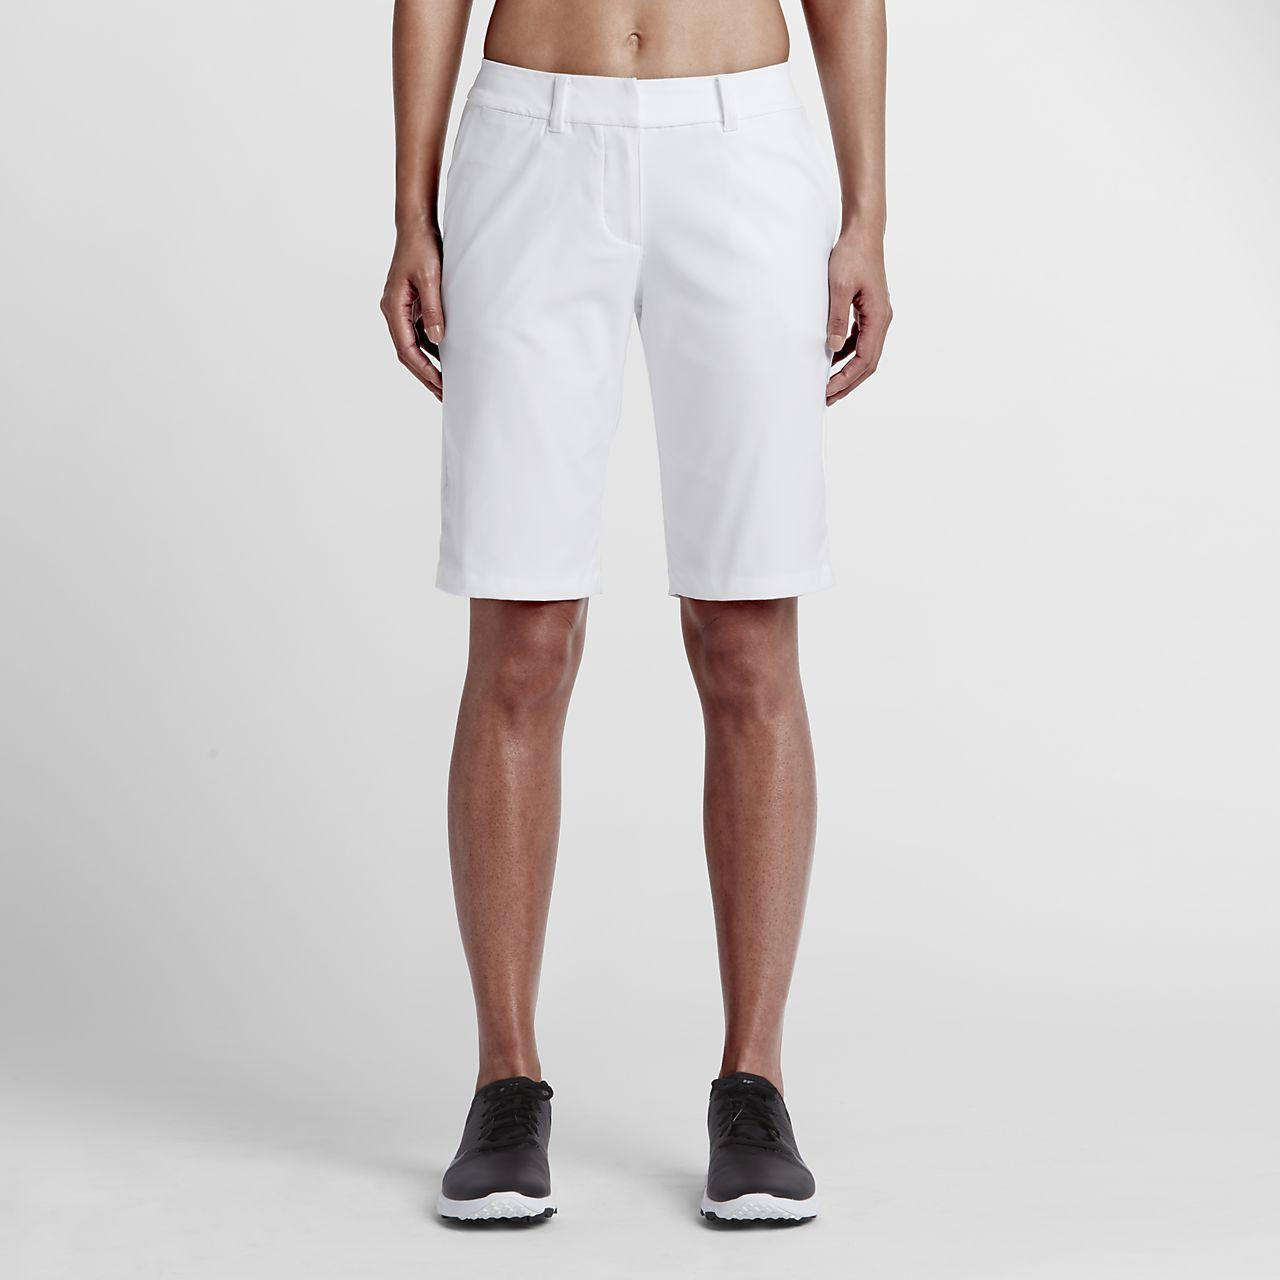 Golf Shorts Nike Dry Women's 11\